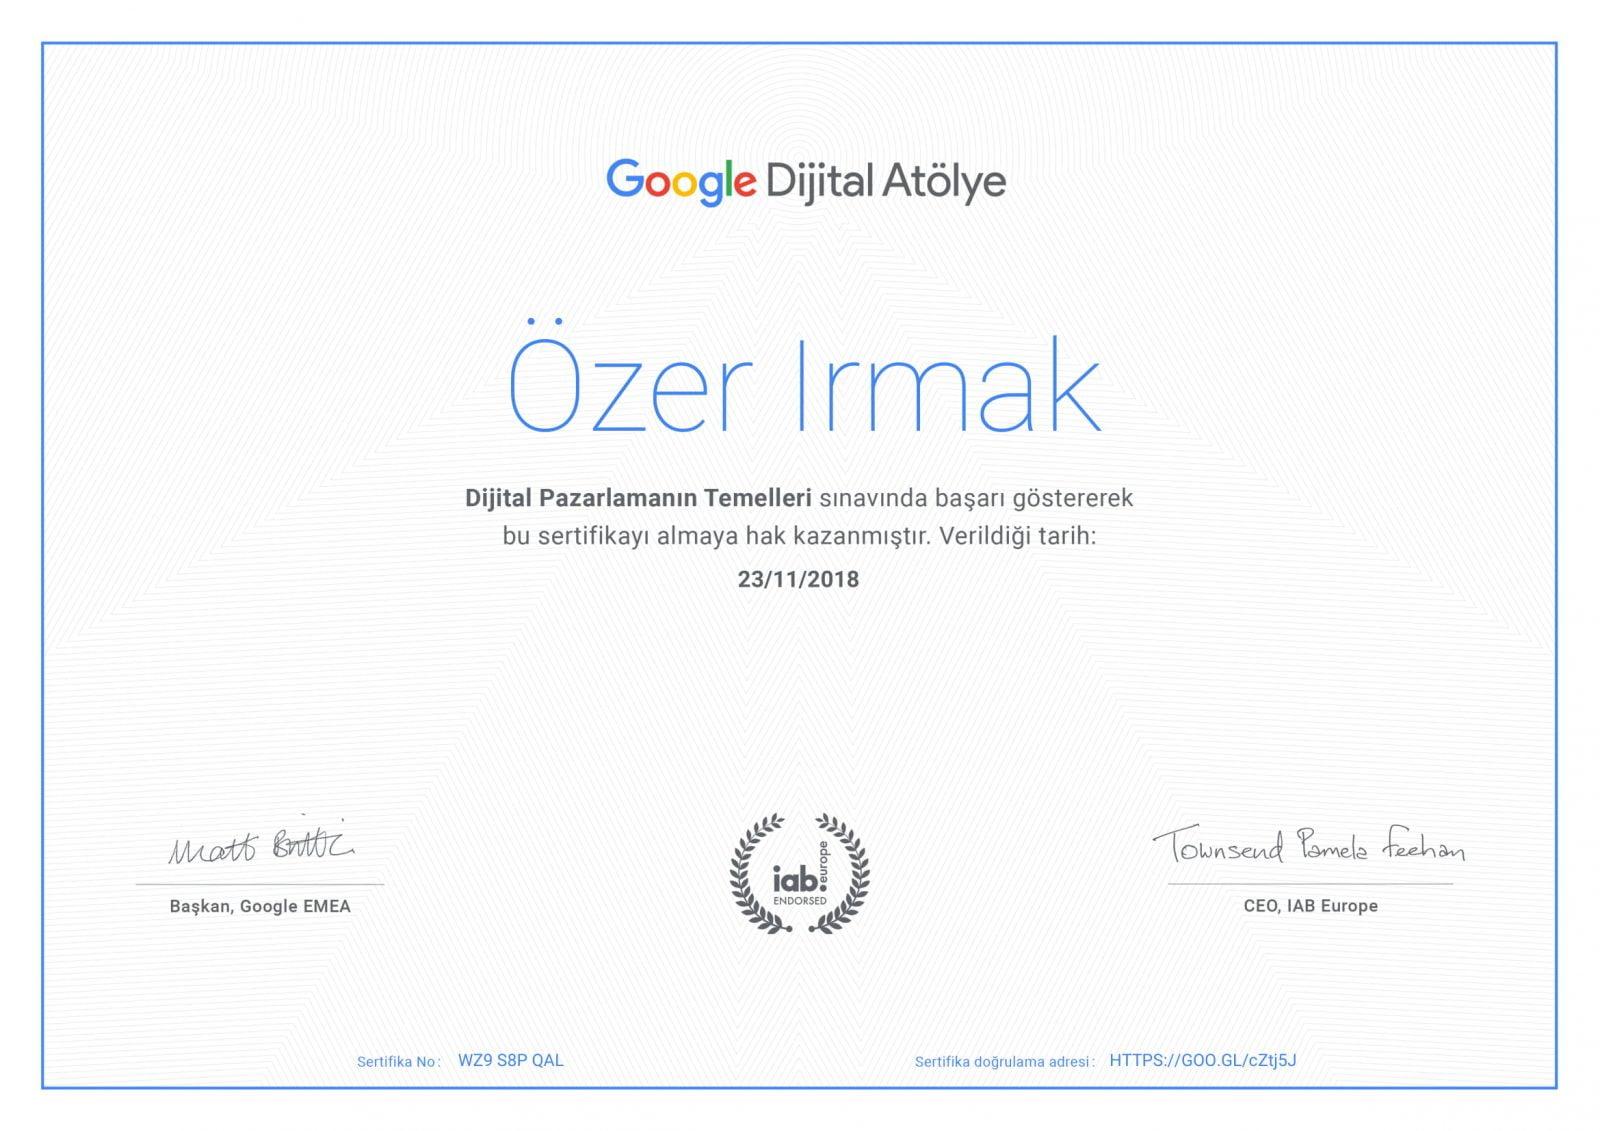 Dijital Atölye Sertifikasyonu - SERTİFİKALARIM